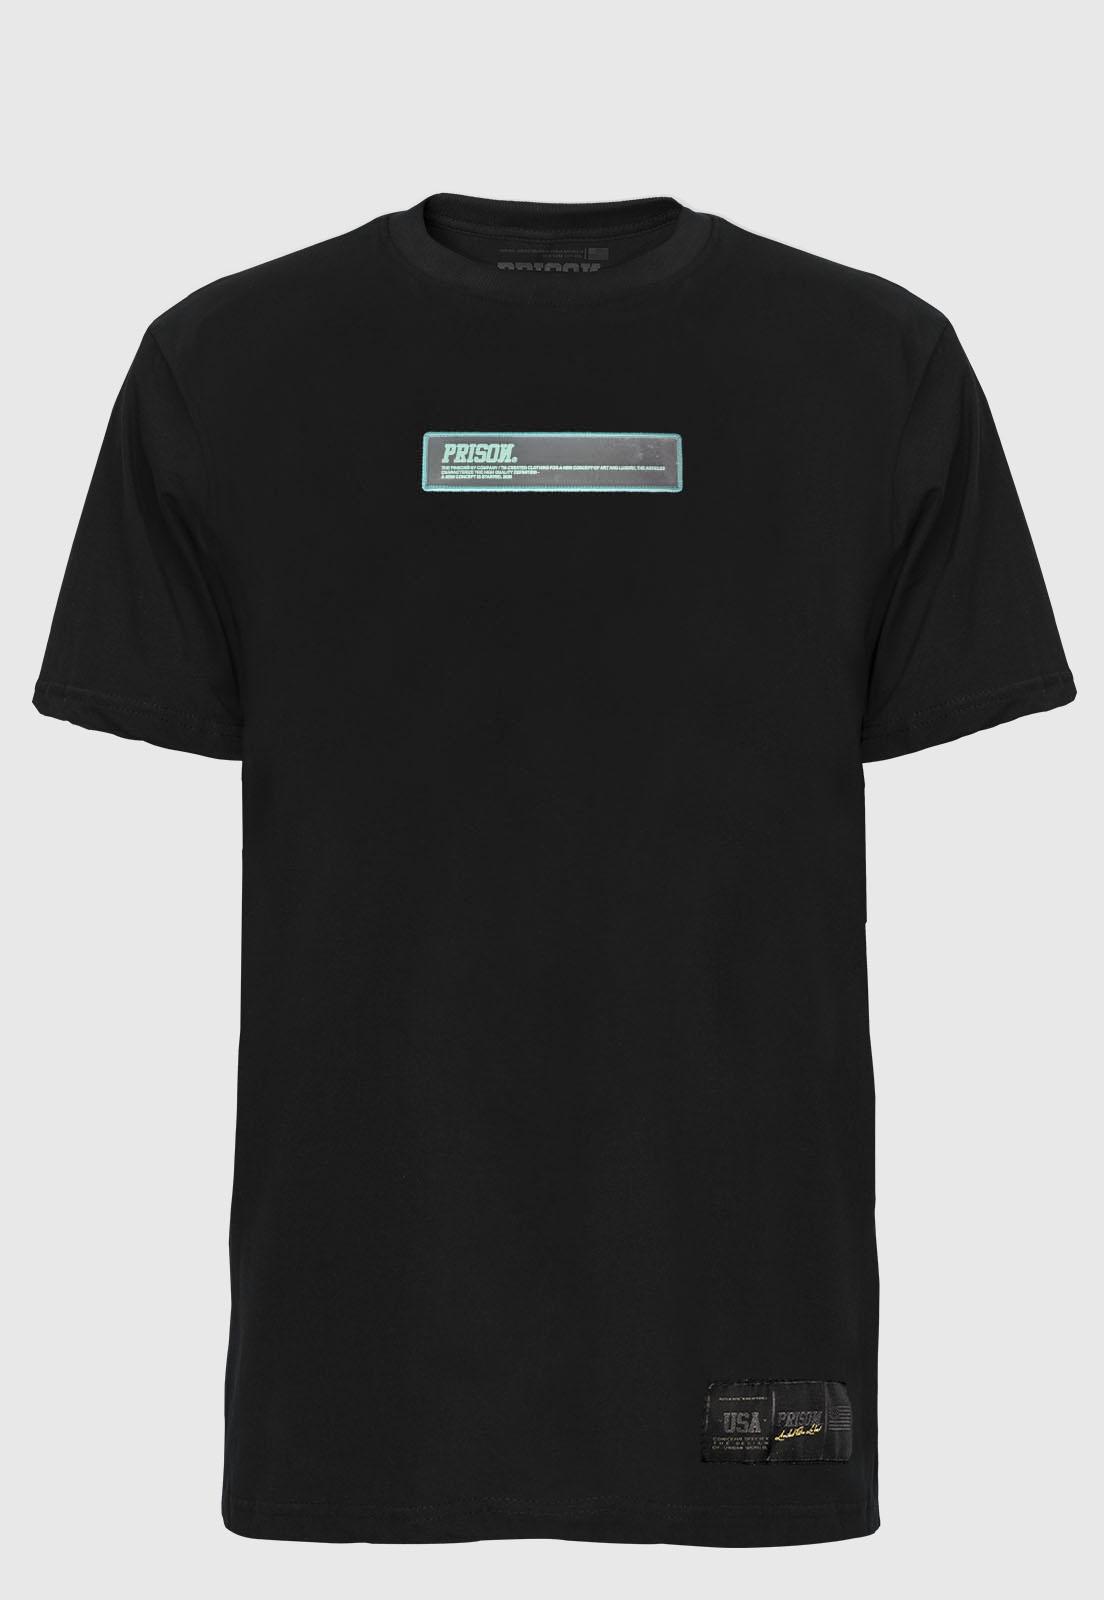 Camiseta Streetwear Prison Concept